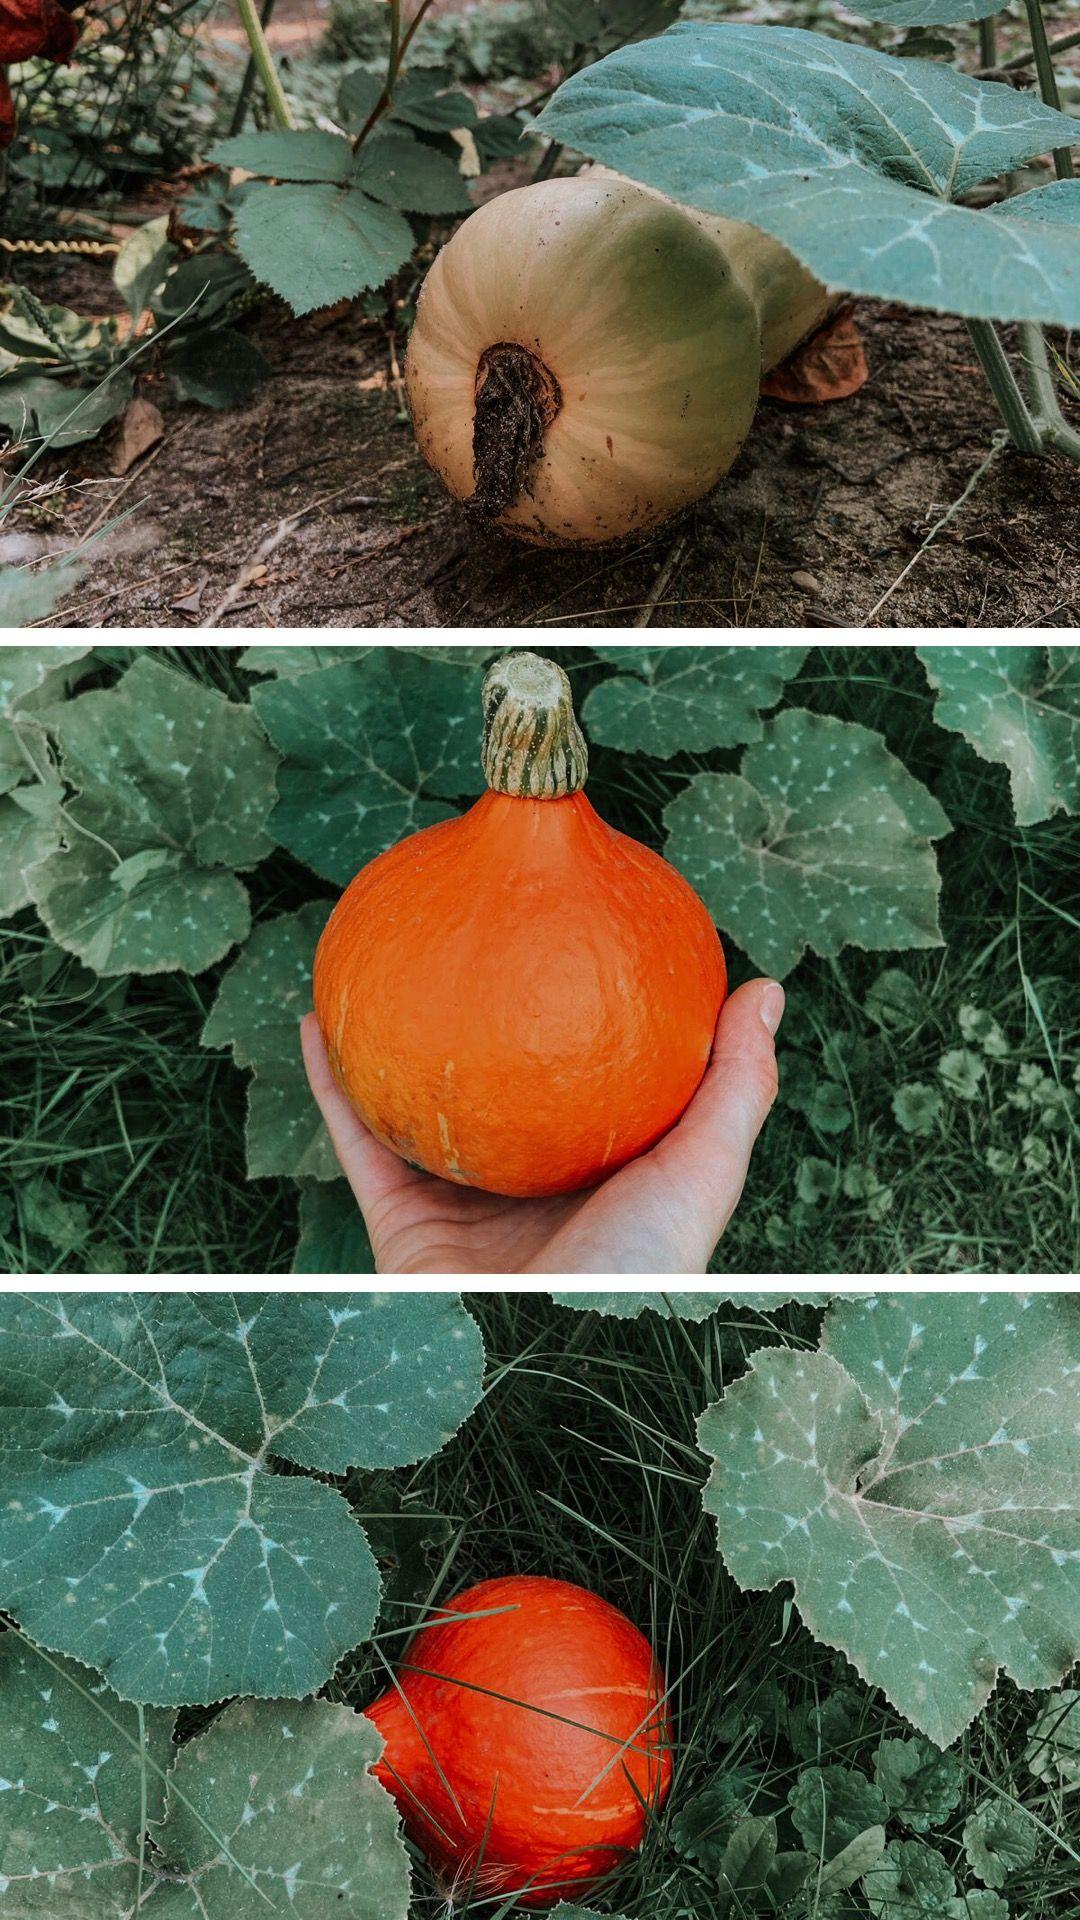 Pumpkins Pumpkin Fall Season Vegetables